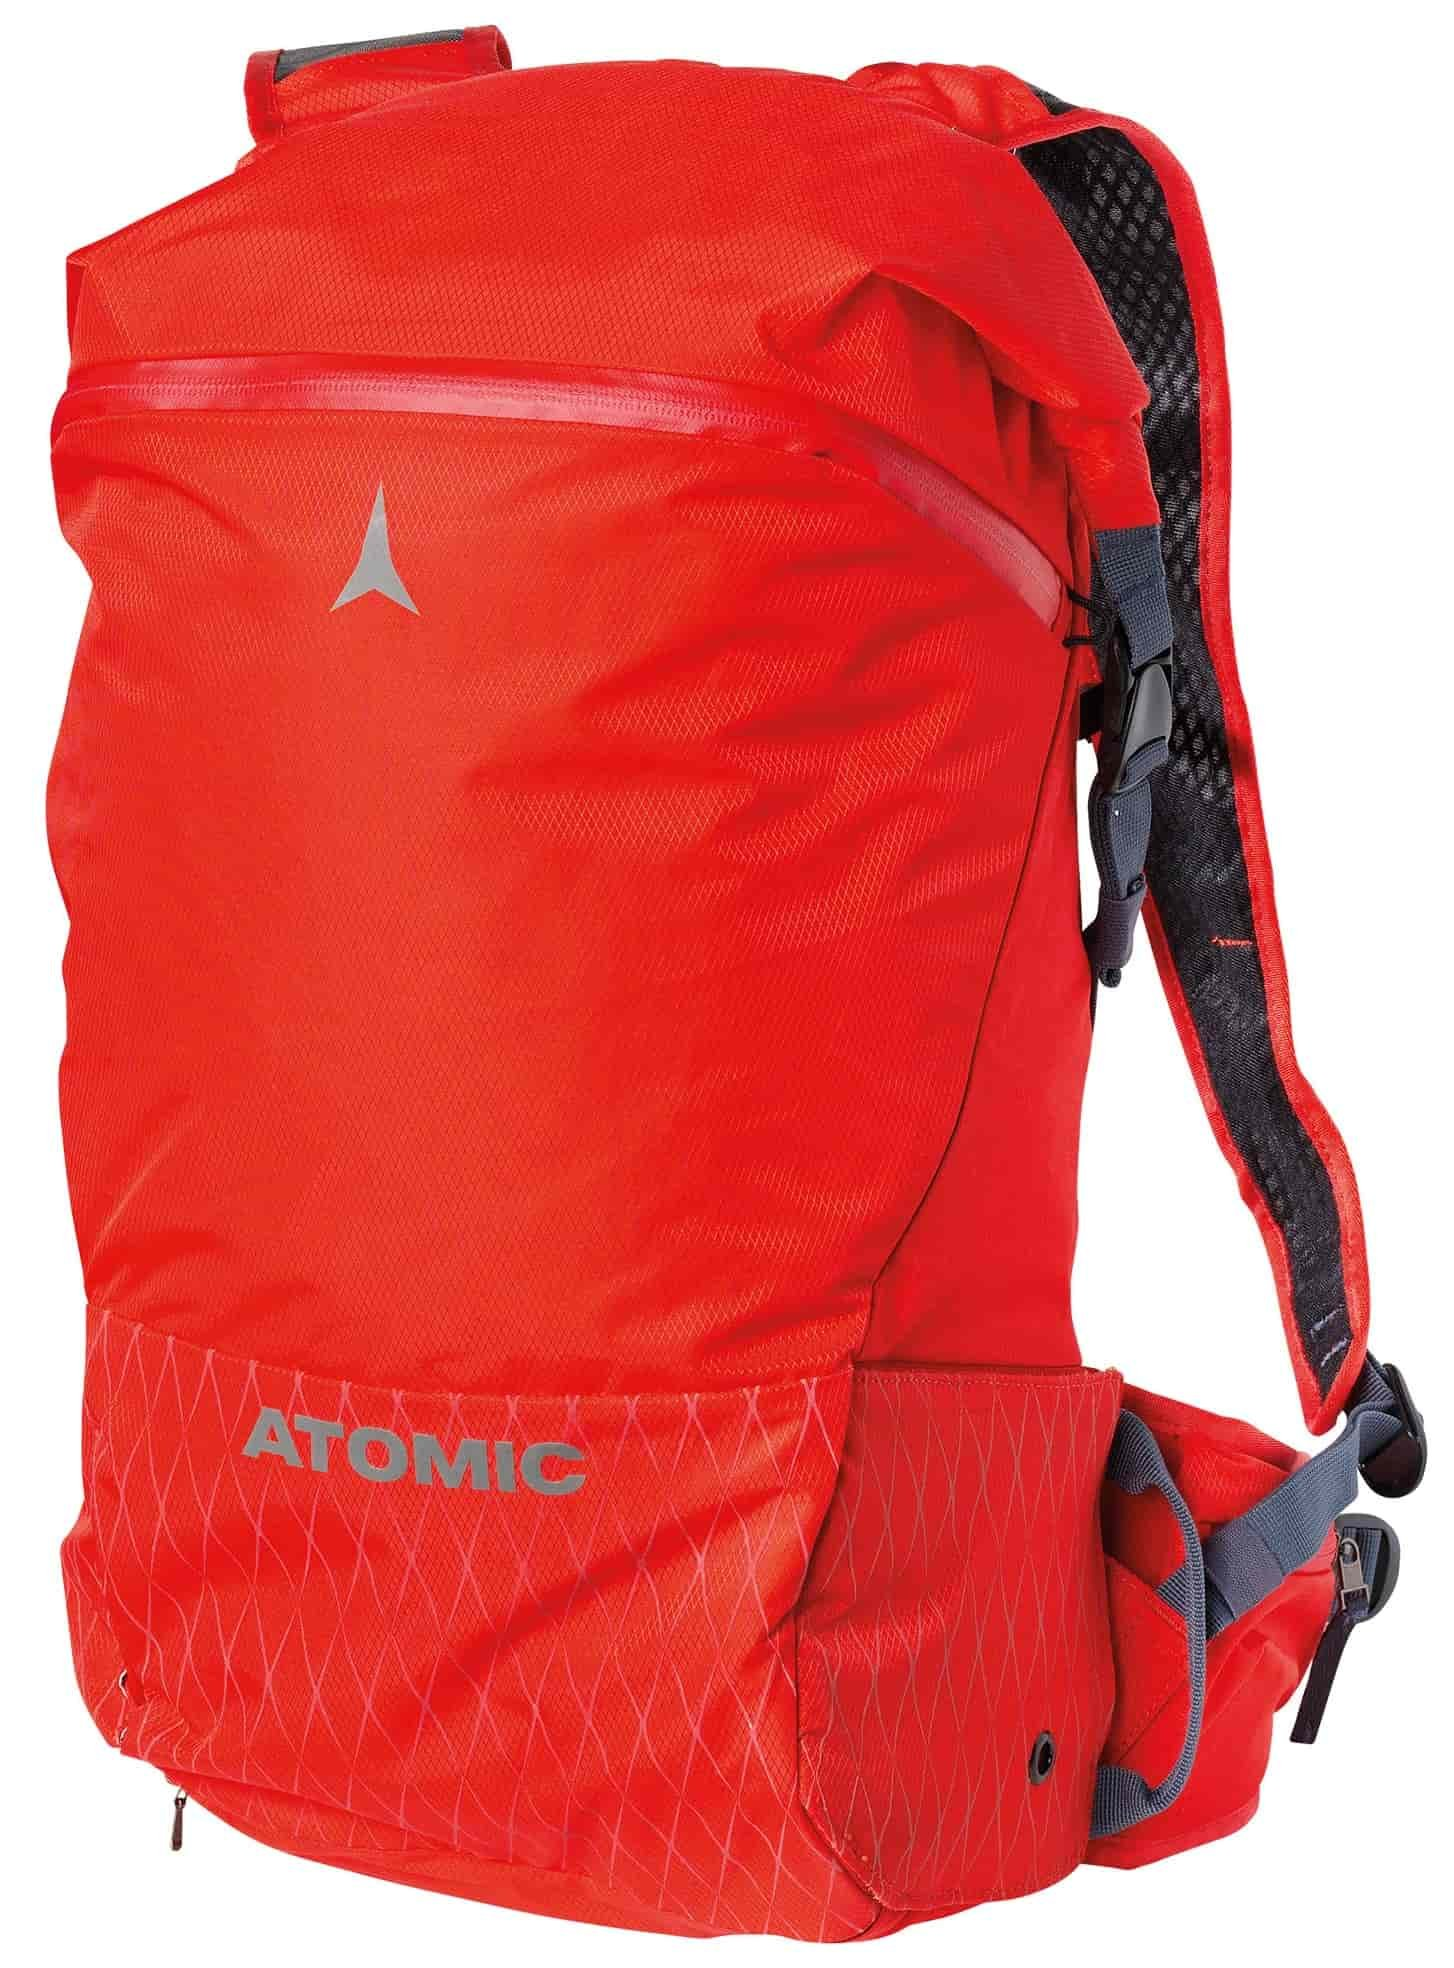 Atomic Backland 22+ Backpack